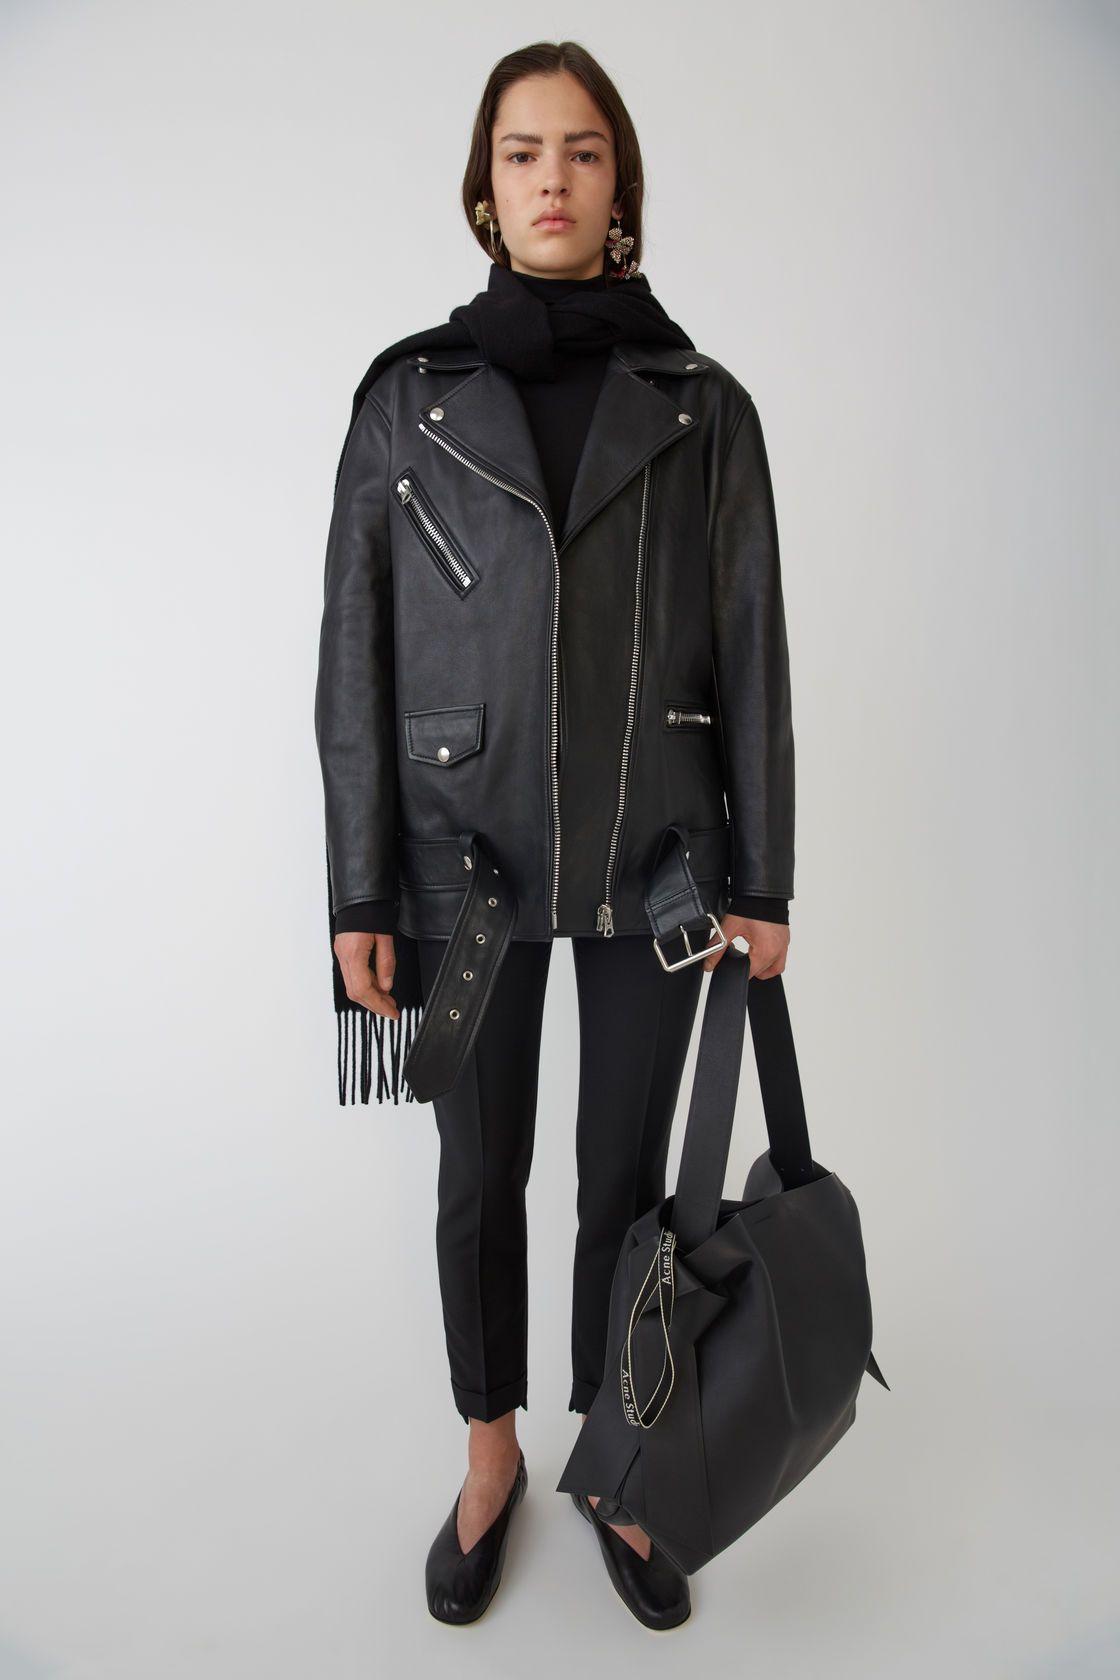 Acne Studios Oversized Leather Jacket Biker Jacket Outfit Women Best Leather Jackets Leather Jacket